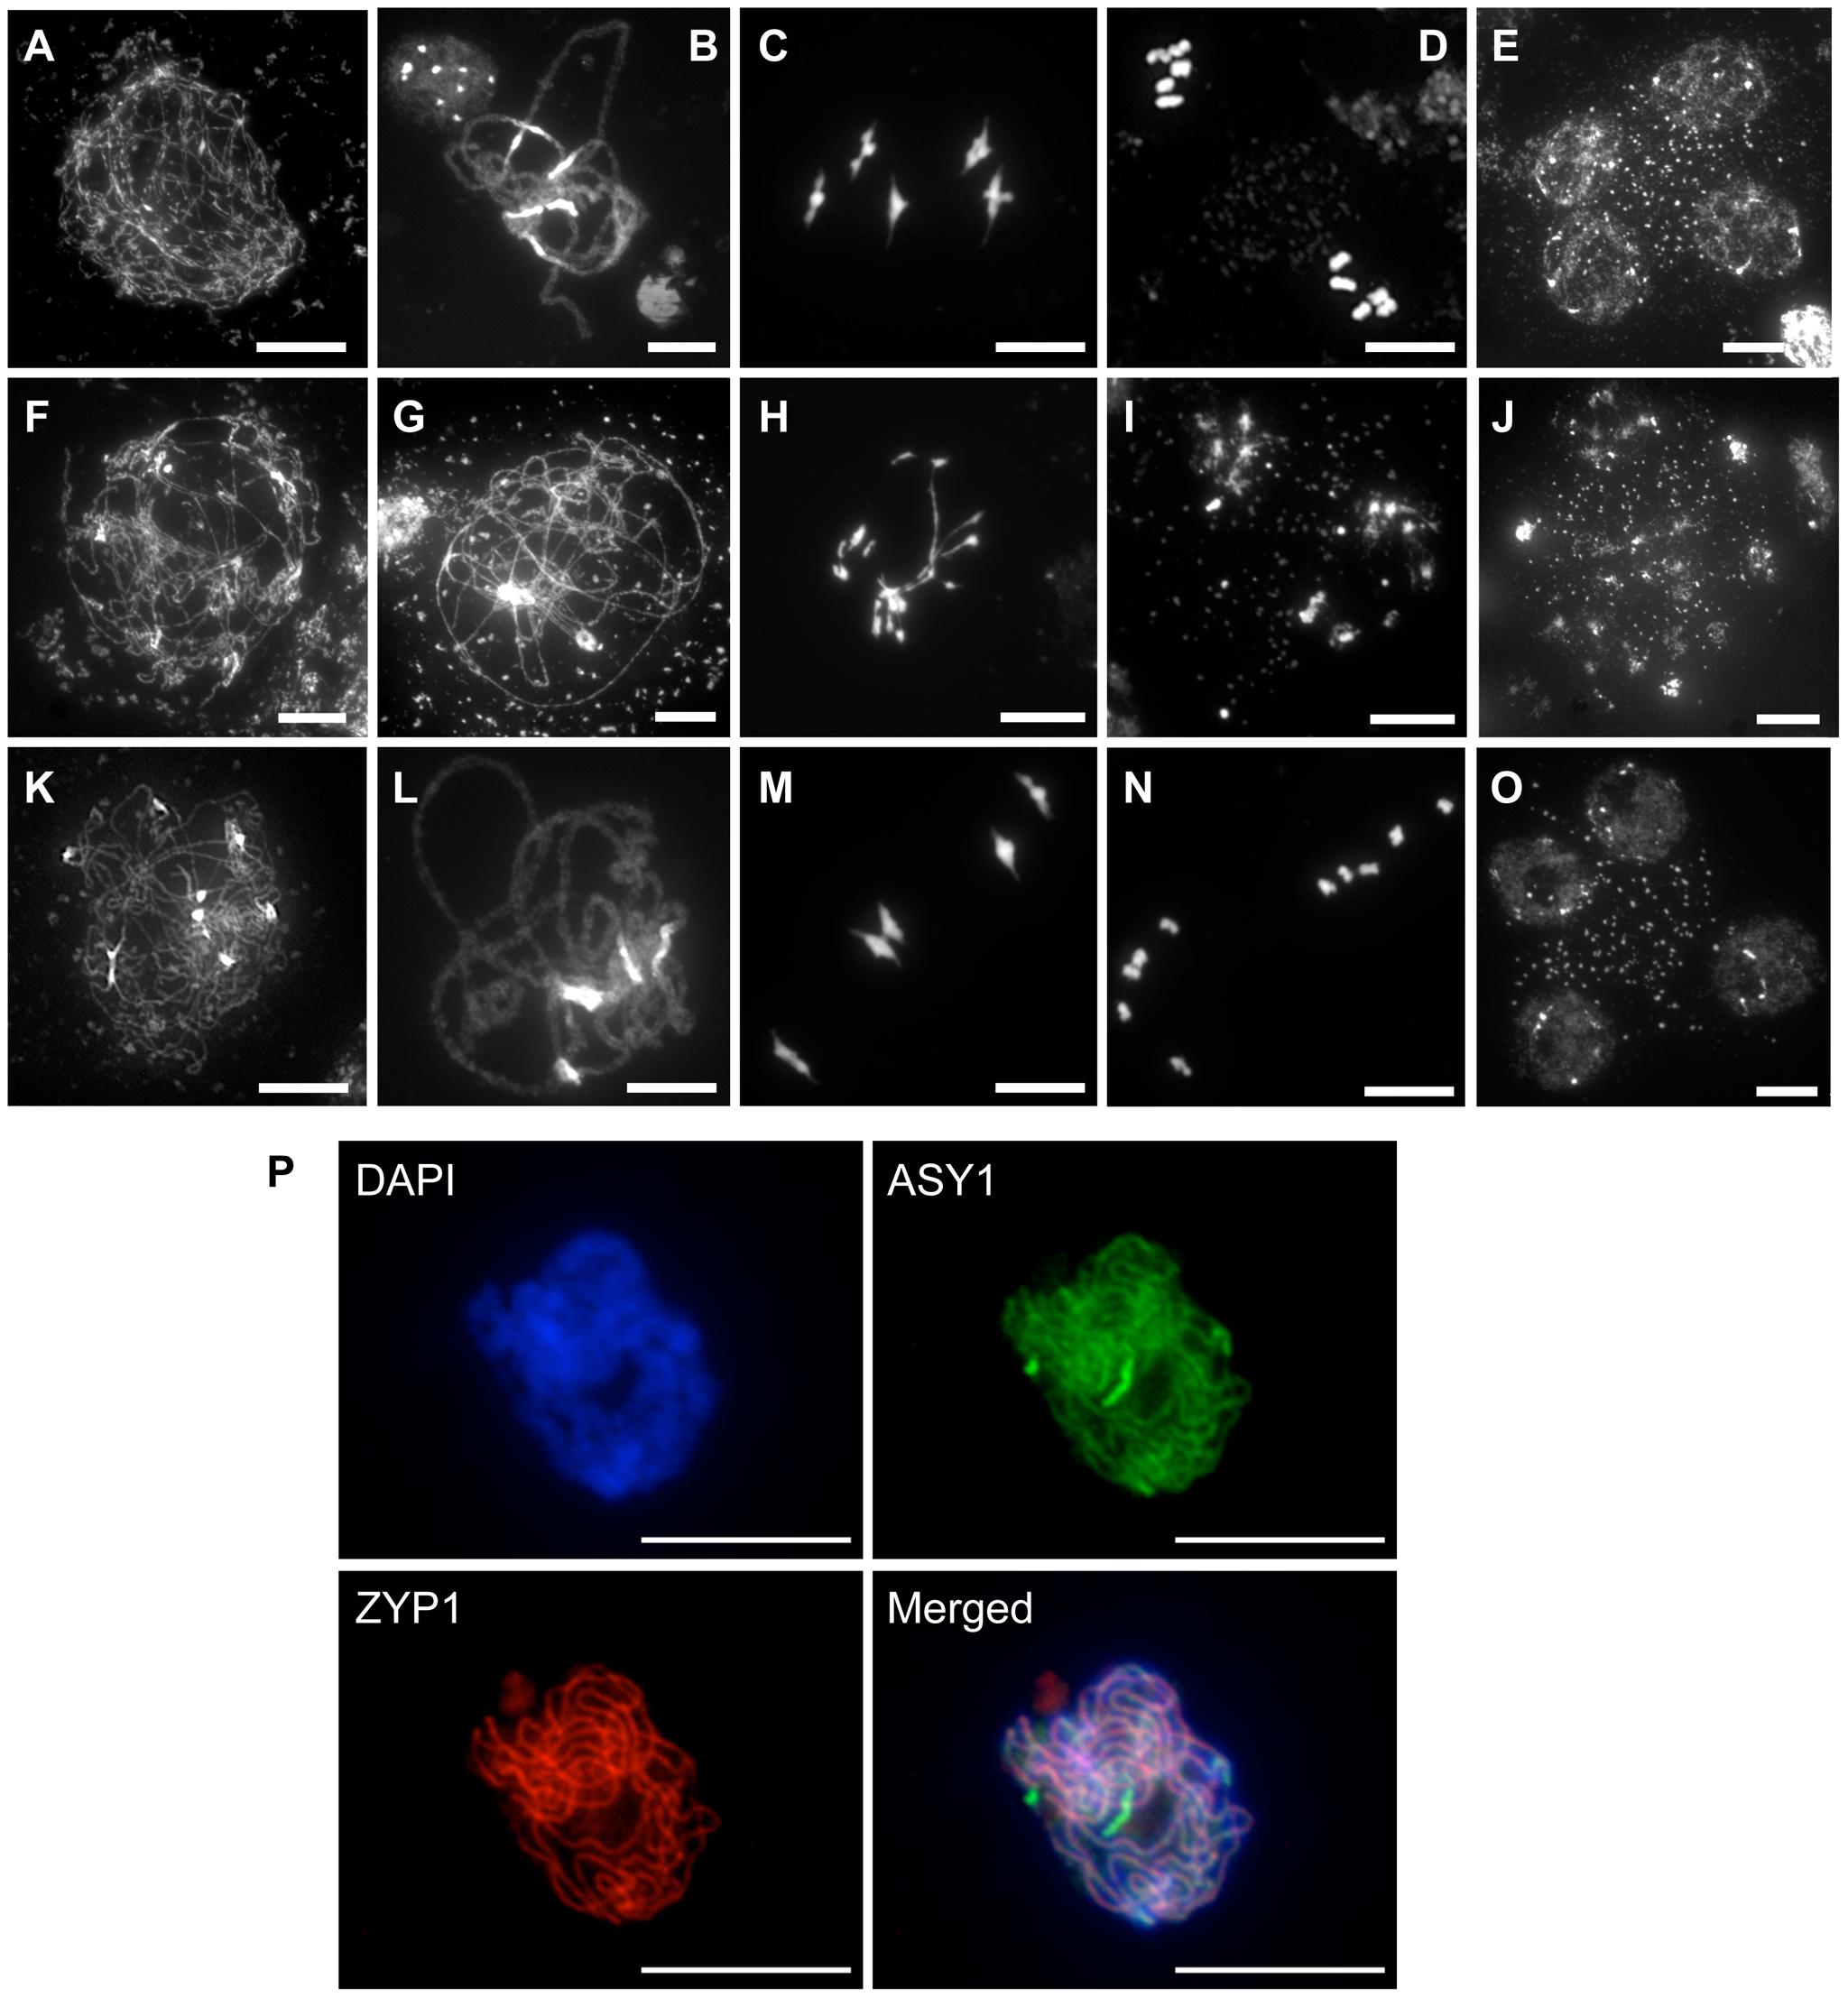 Progression of meiosis in WT (A to E), <i>rad51/rad51</i> (F to J) and <i>rad51/rad51</i> plants expressing the RAD51-GFP fusion protein (K to O).